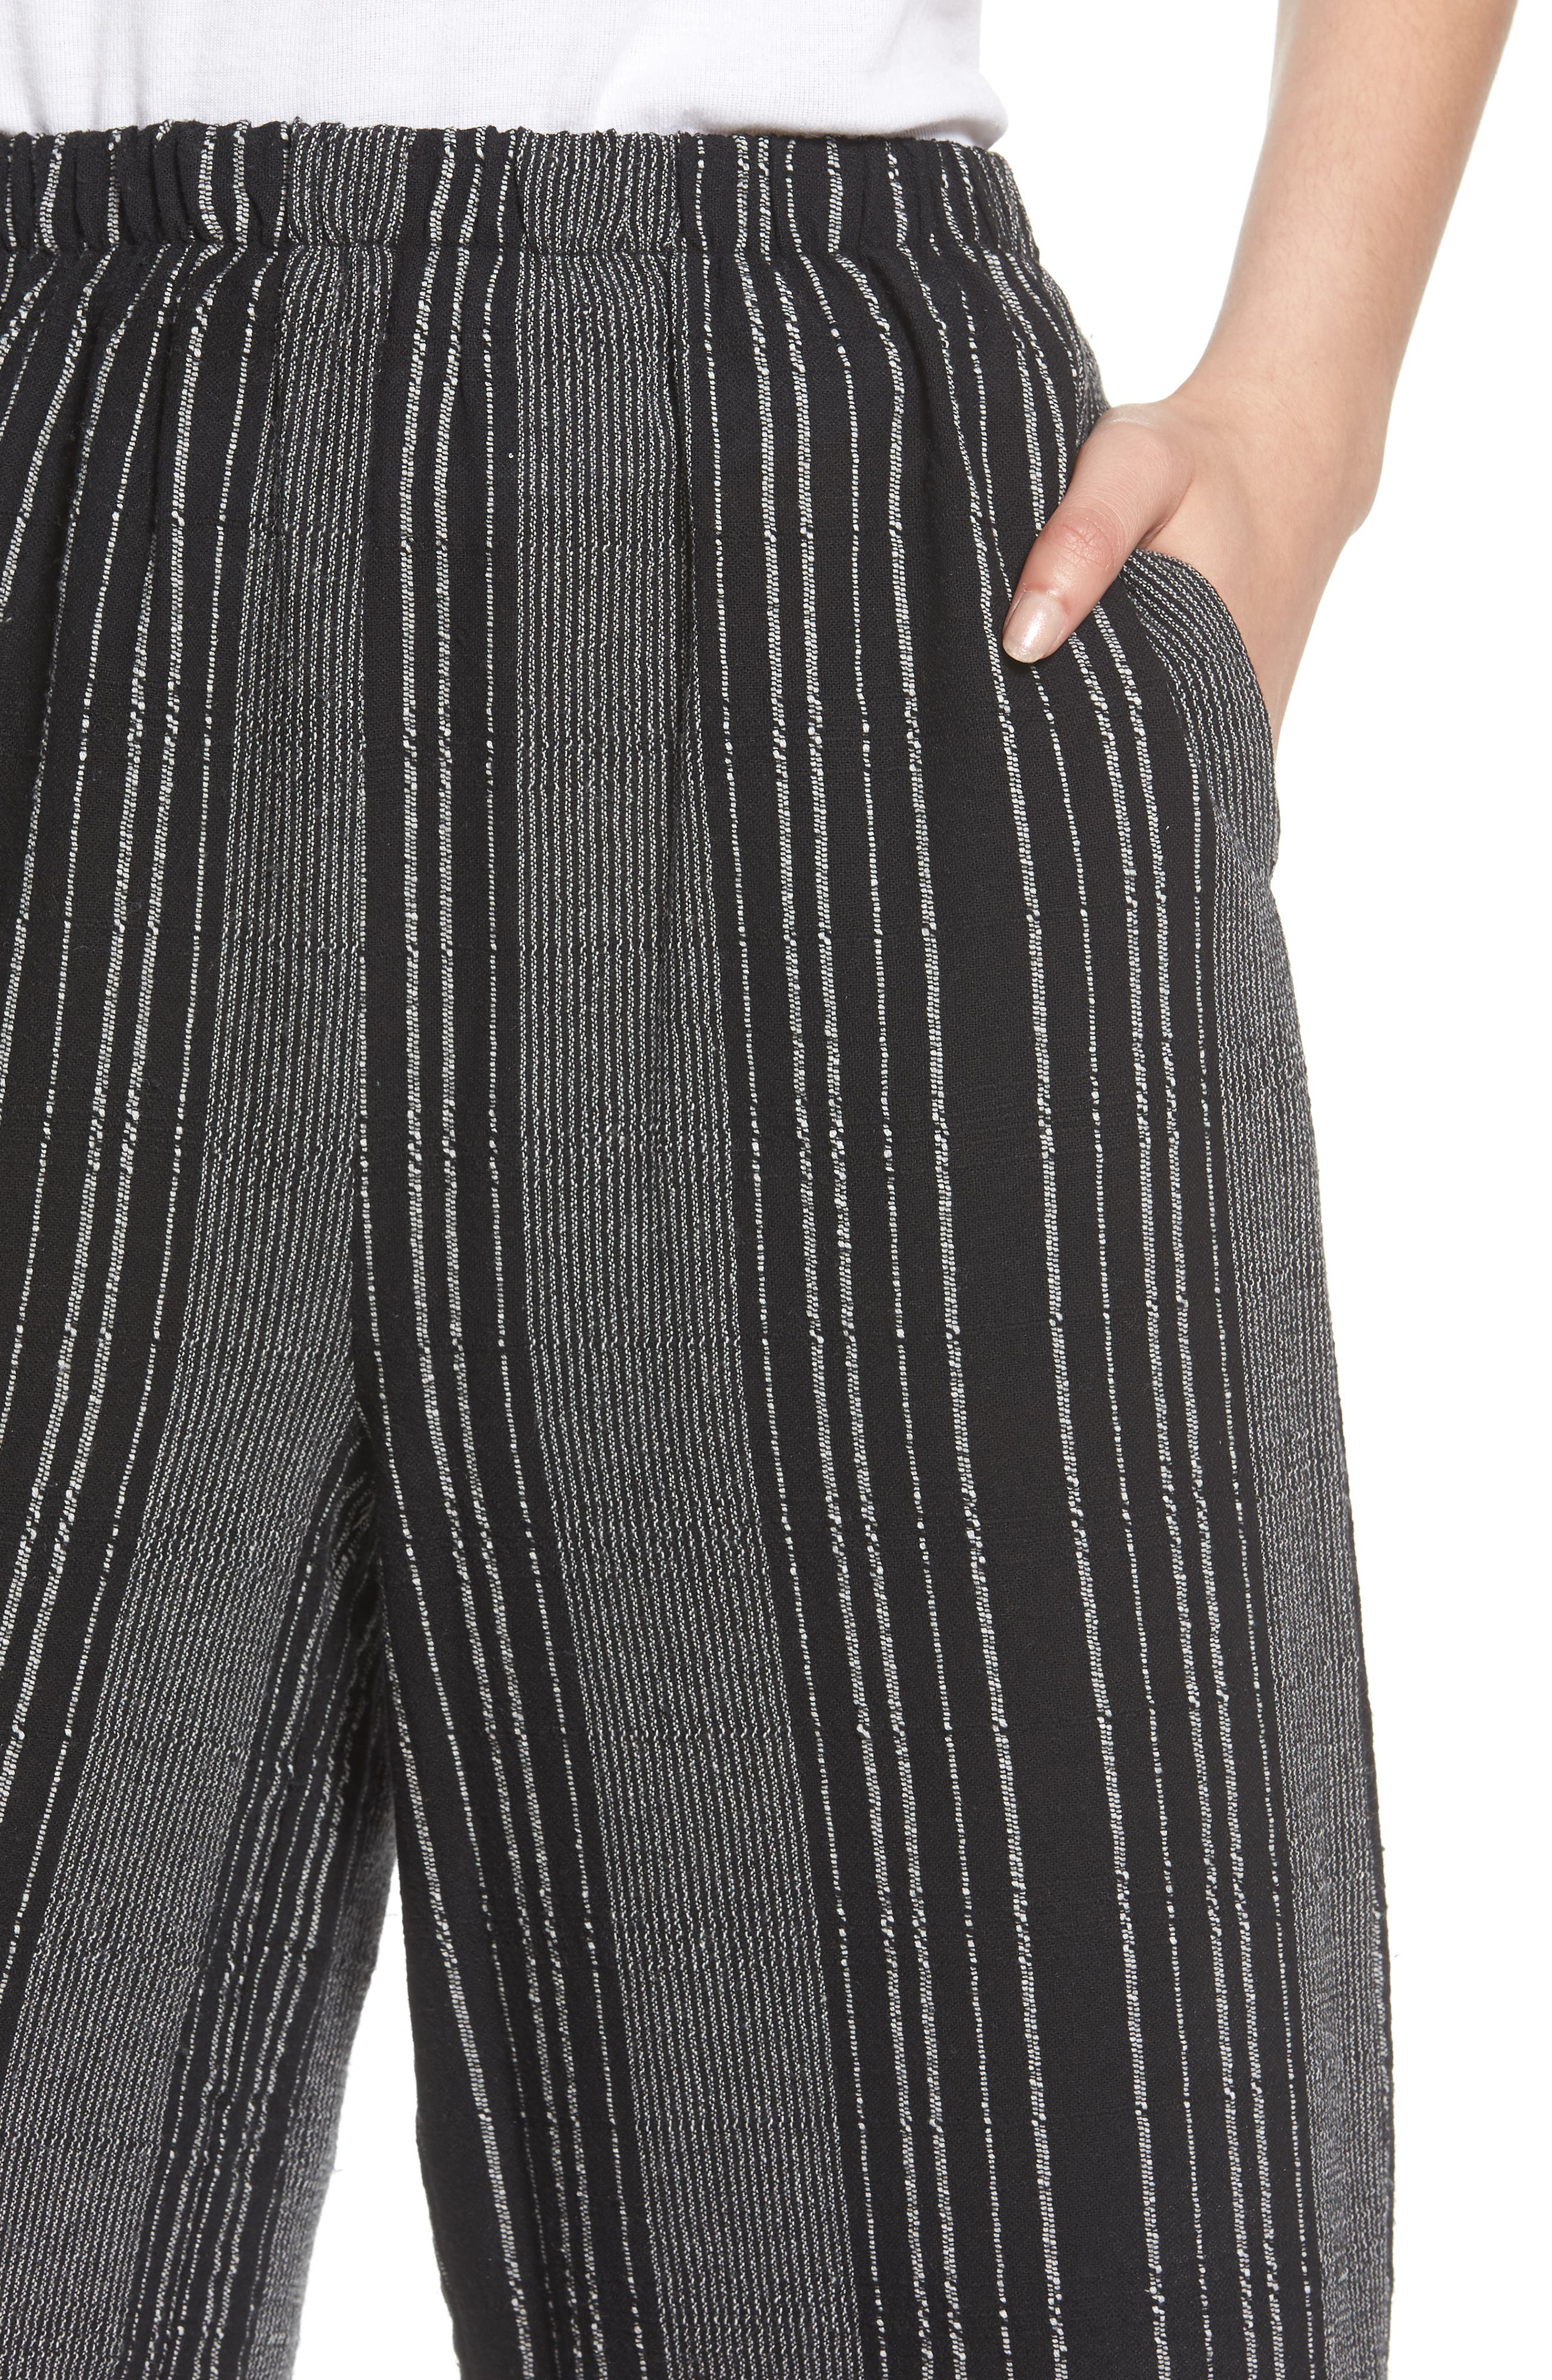 Bella Stripe Crop Pants,                             Alternate thumbnail 6, color,                             Black